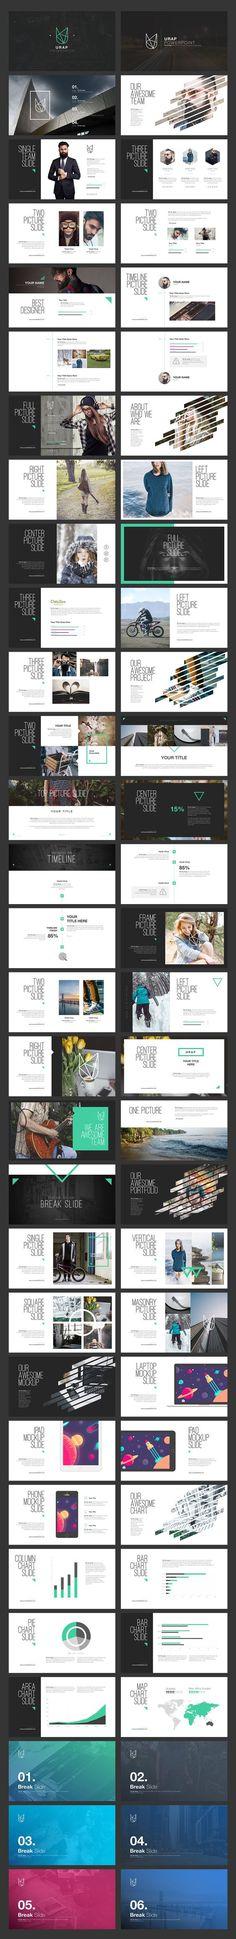 Design | grafisch | communicatie | com4nsm